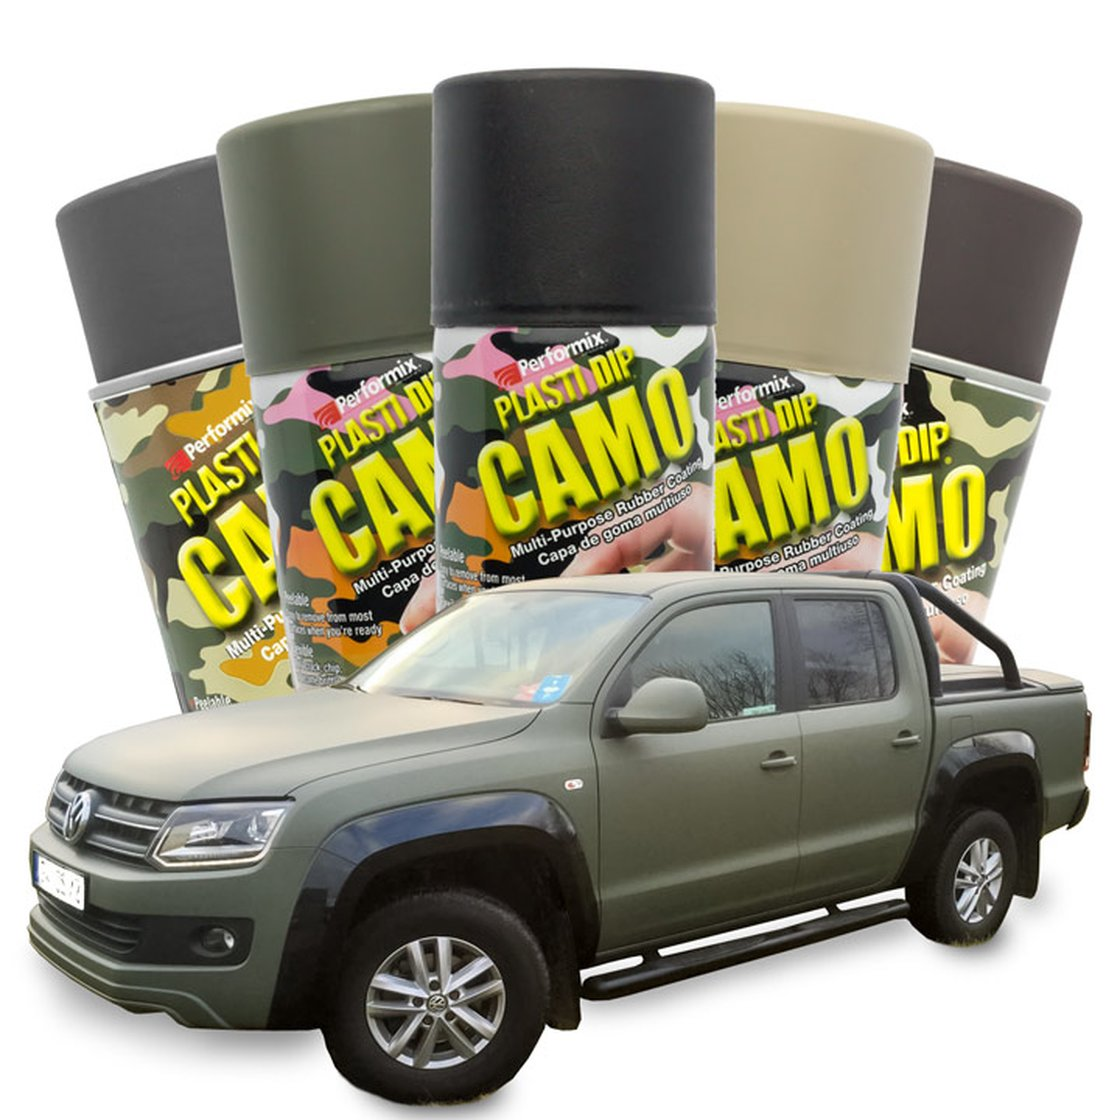 plasti dip spray 325 ml camo schwarz aerosol 11 oz camo black 16 99. Black Bedroom Furniture Sets. Home Design Ideas